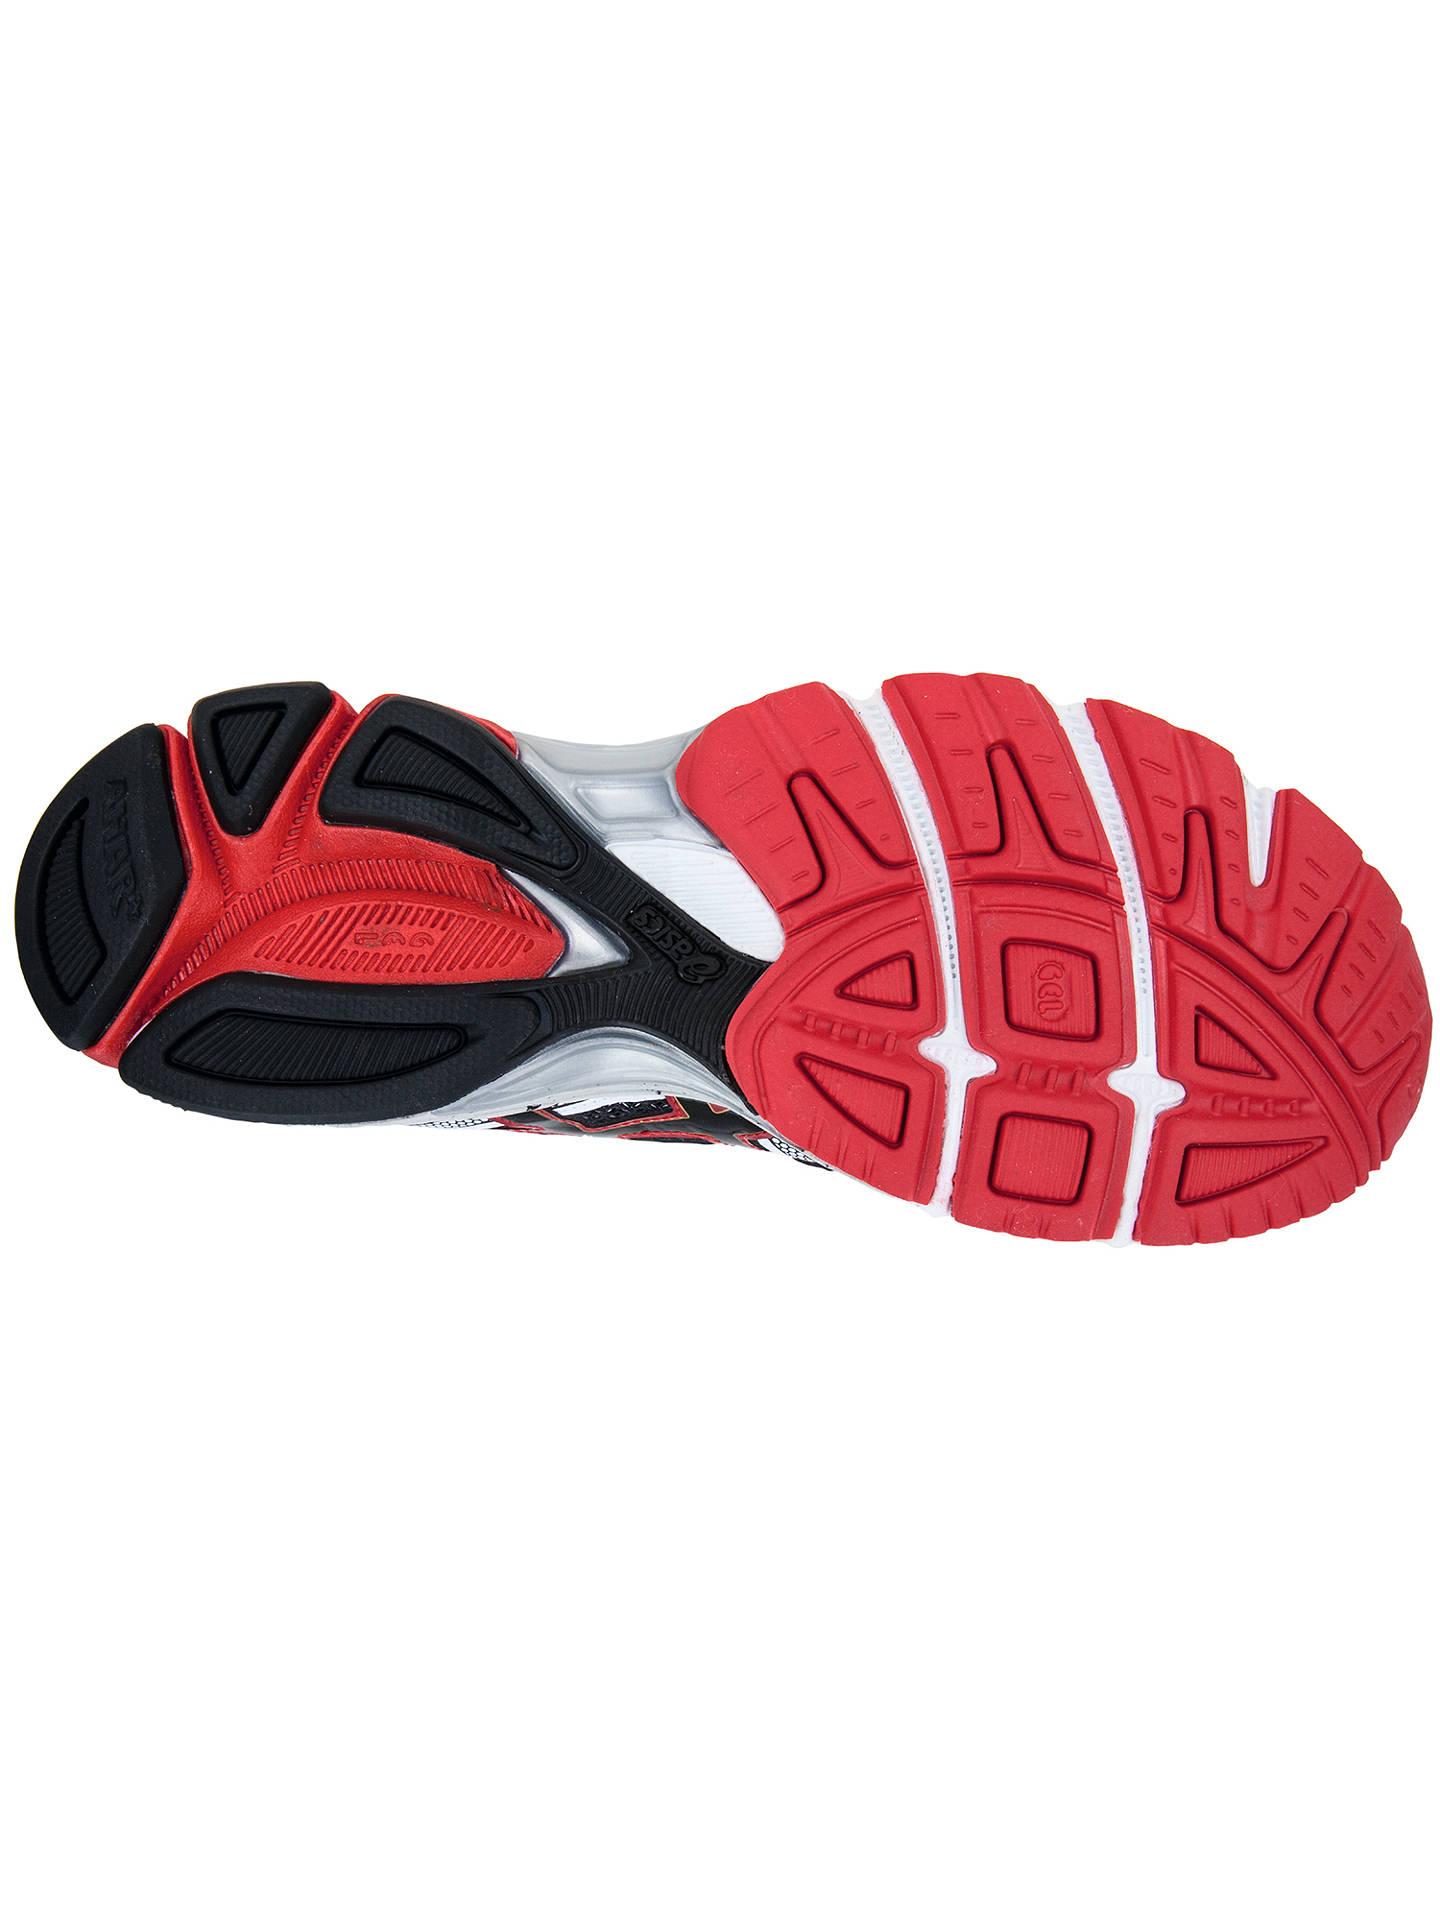 sélection premium 3b10f 574b7 Asics Gel Phoenix 6 Men's Running Shoes, White/Red at John ...